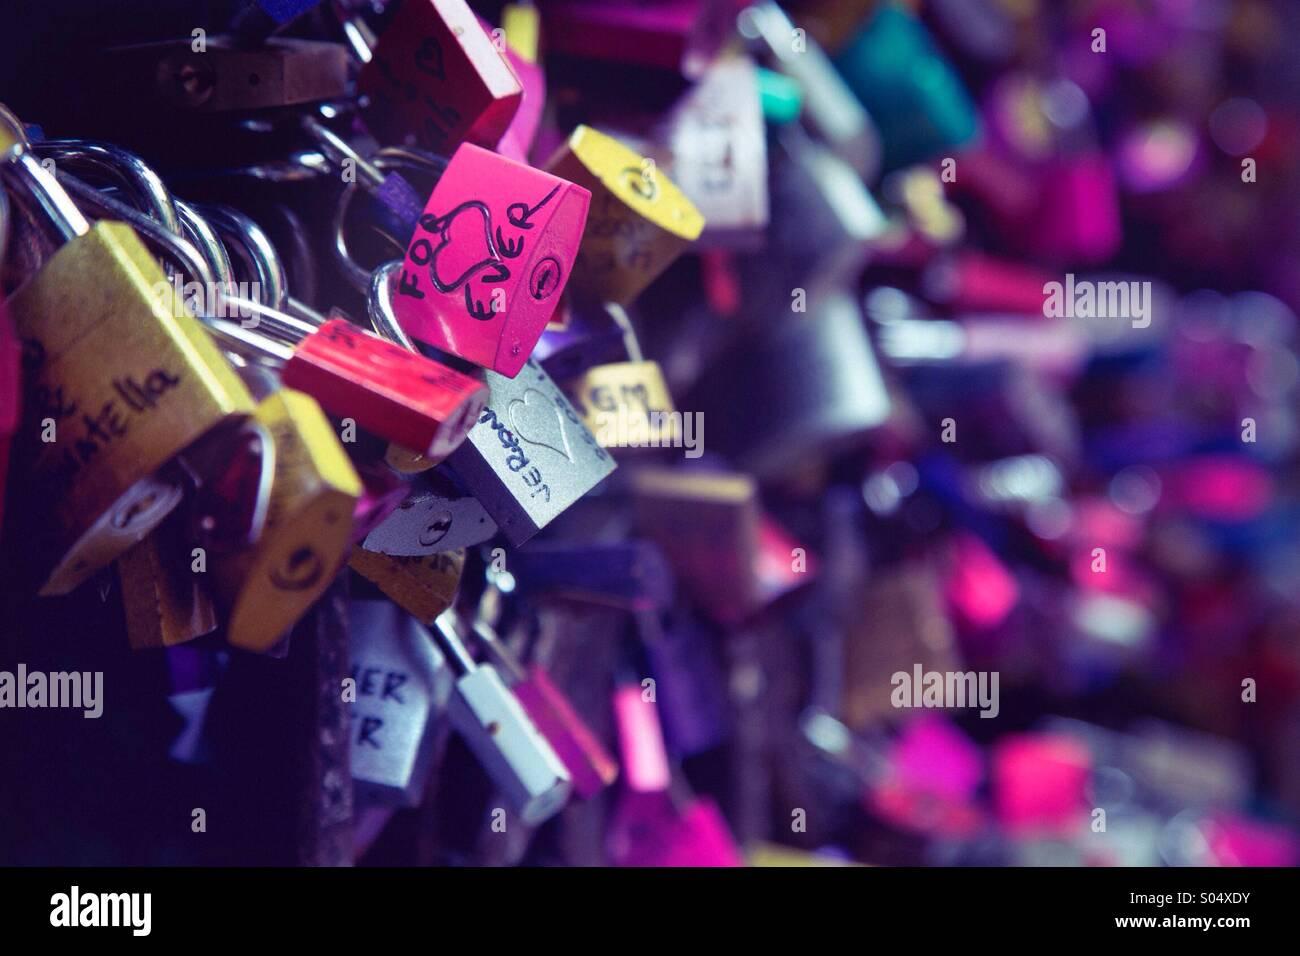 Love locks on the wall at the Romeo and Juliet balcony in Verona, Italy. - Stock Image